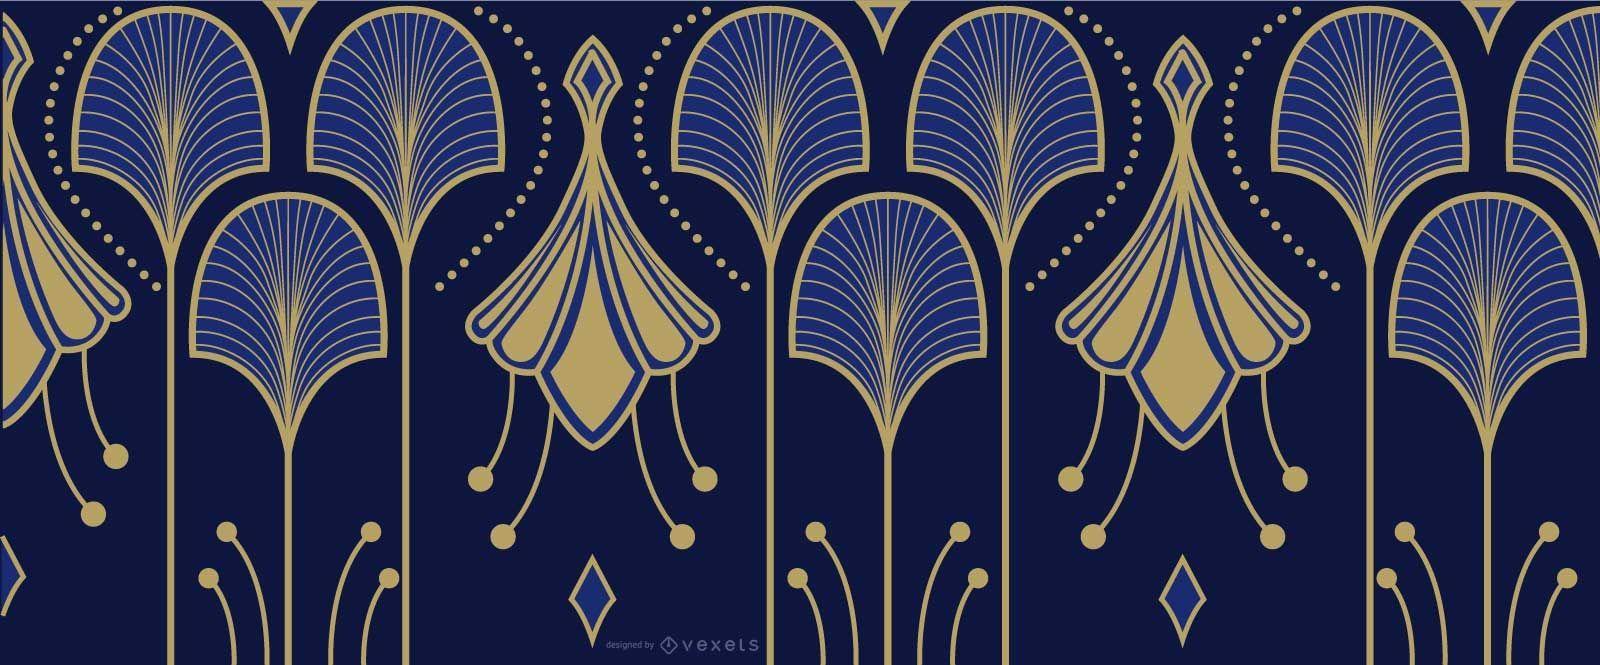 Elegant Blue and gold Art deco